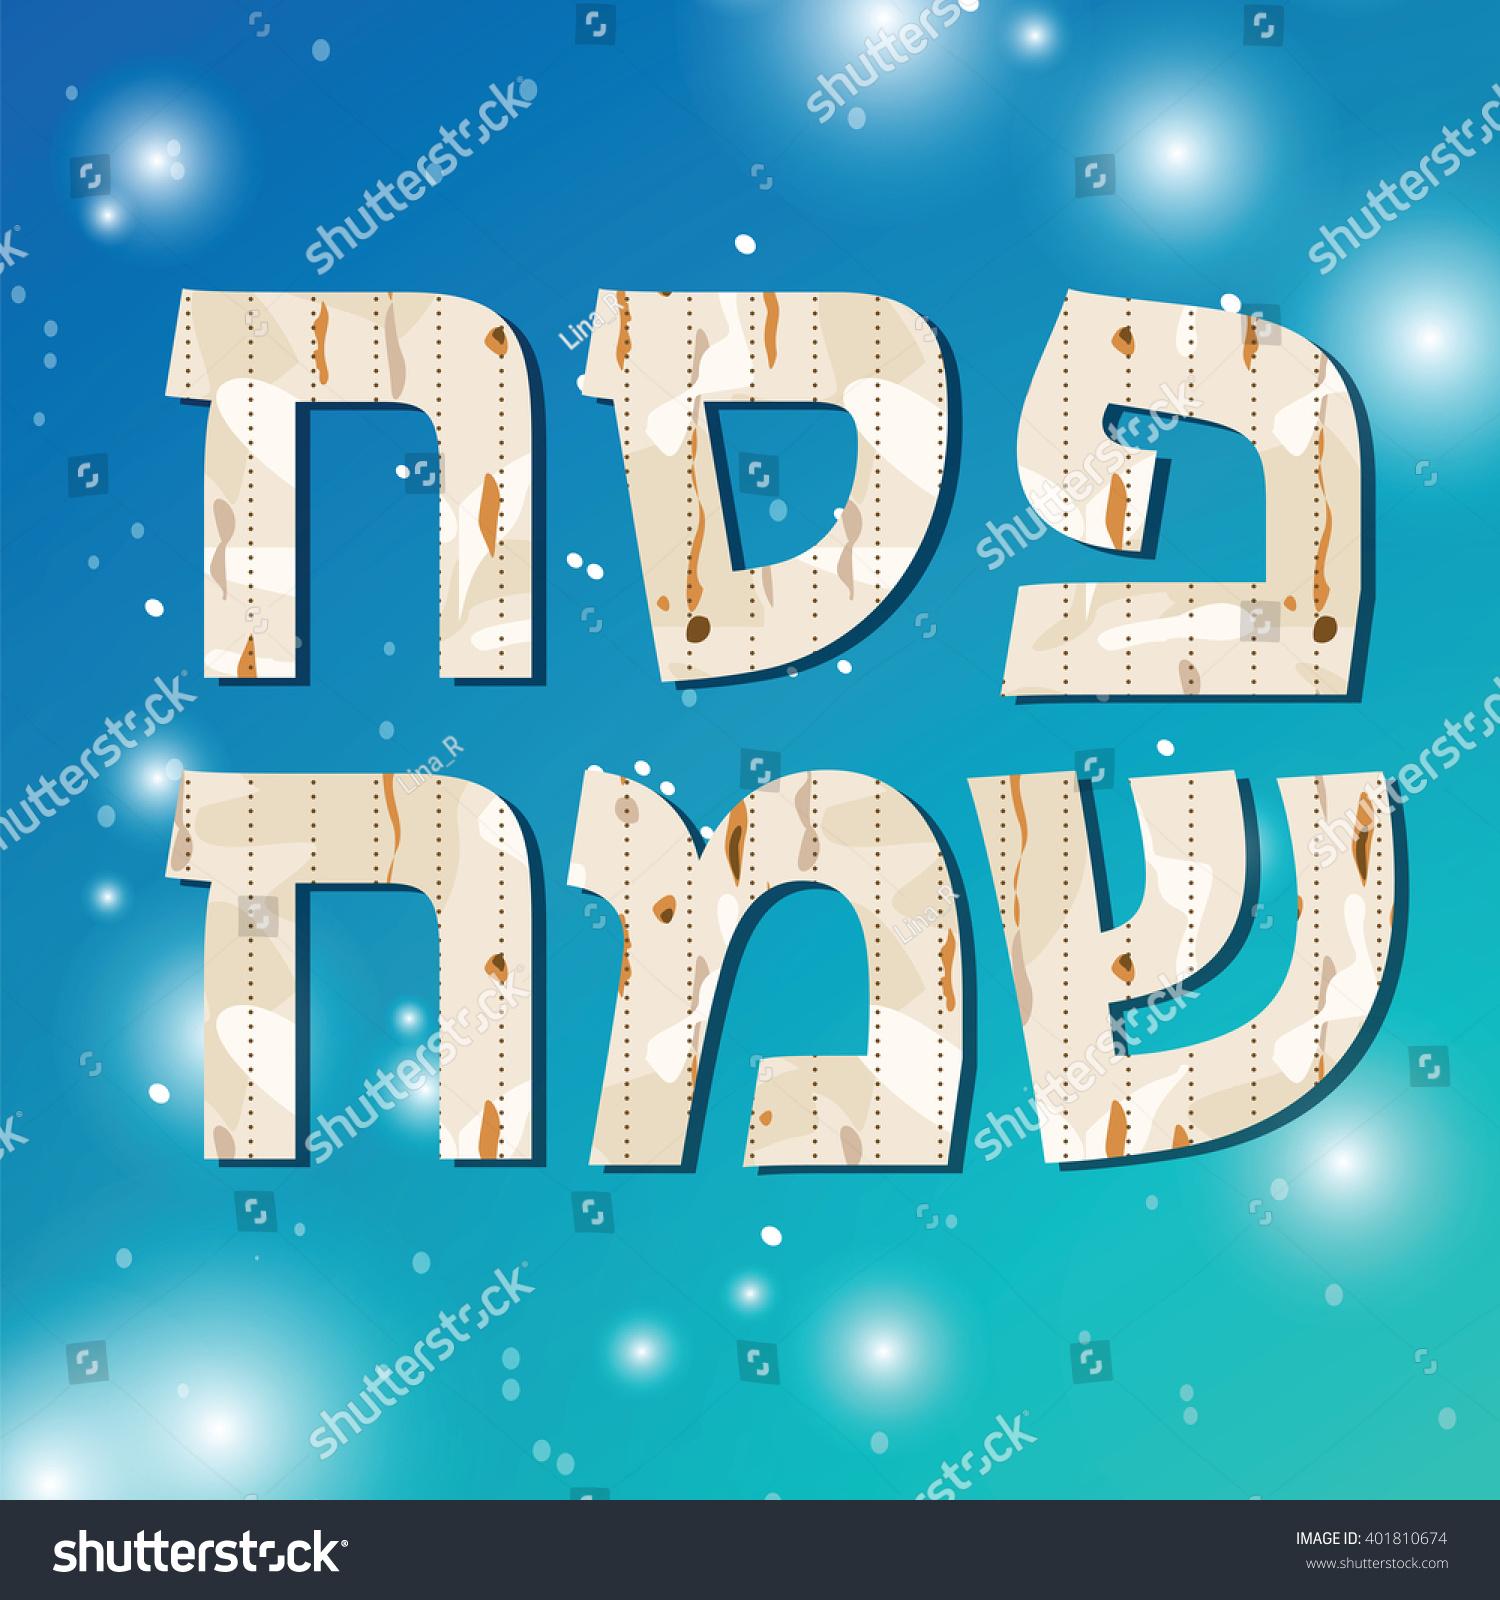 Passover: Israel | Office Holidays